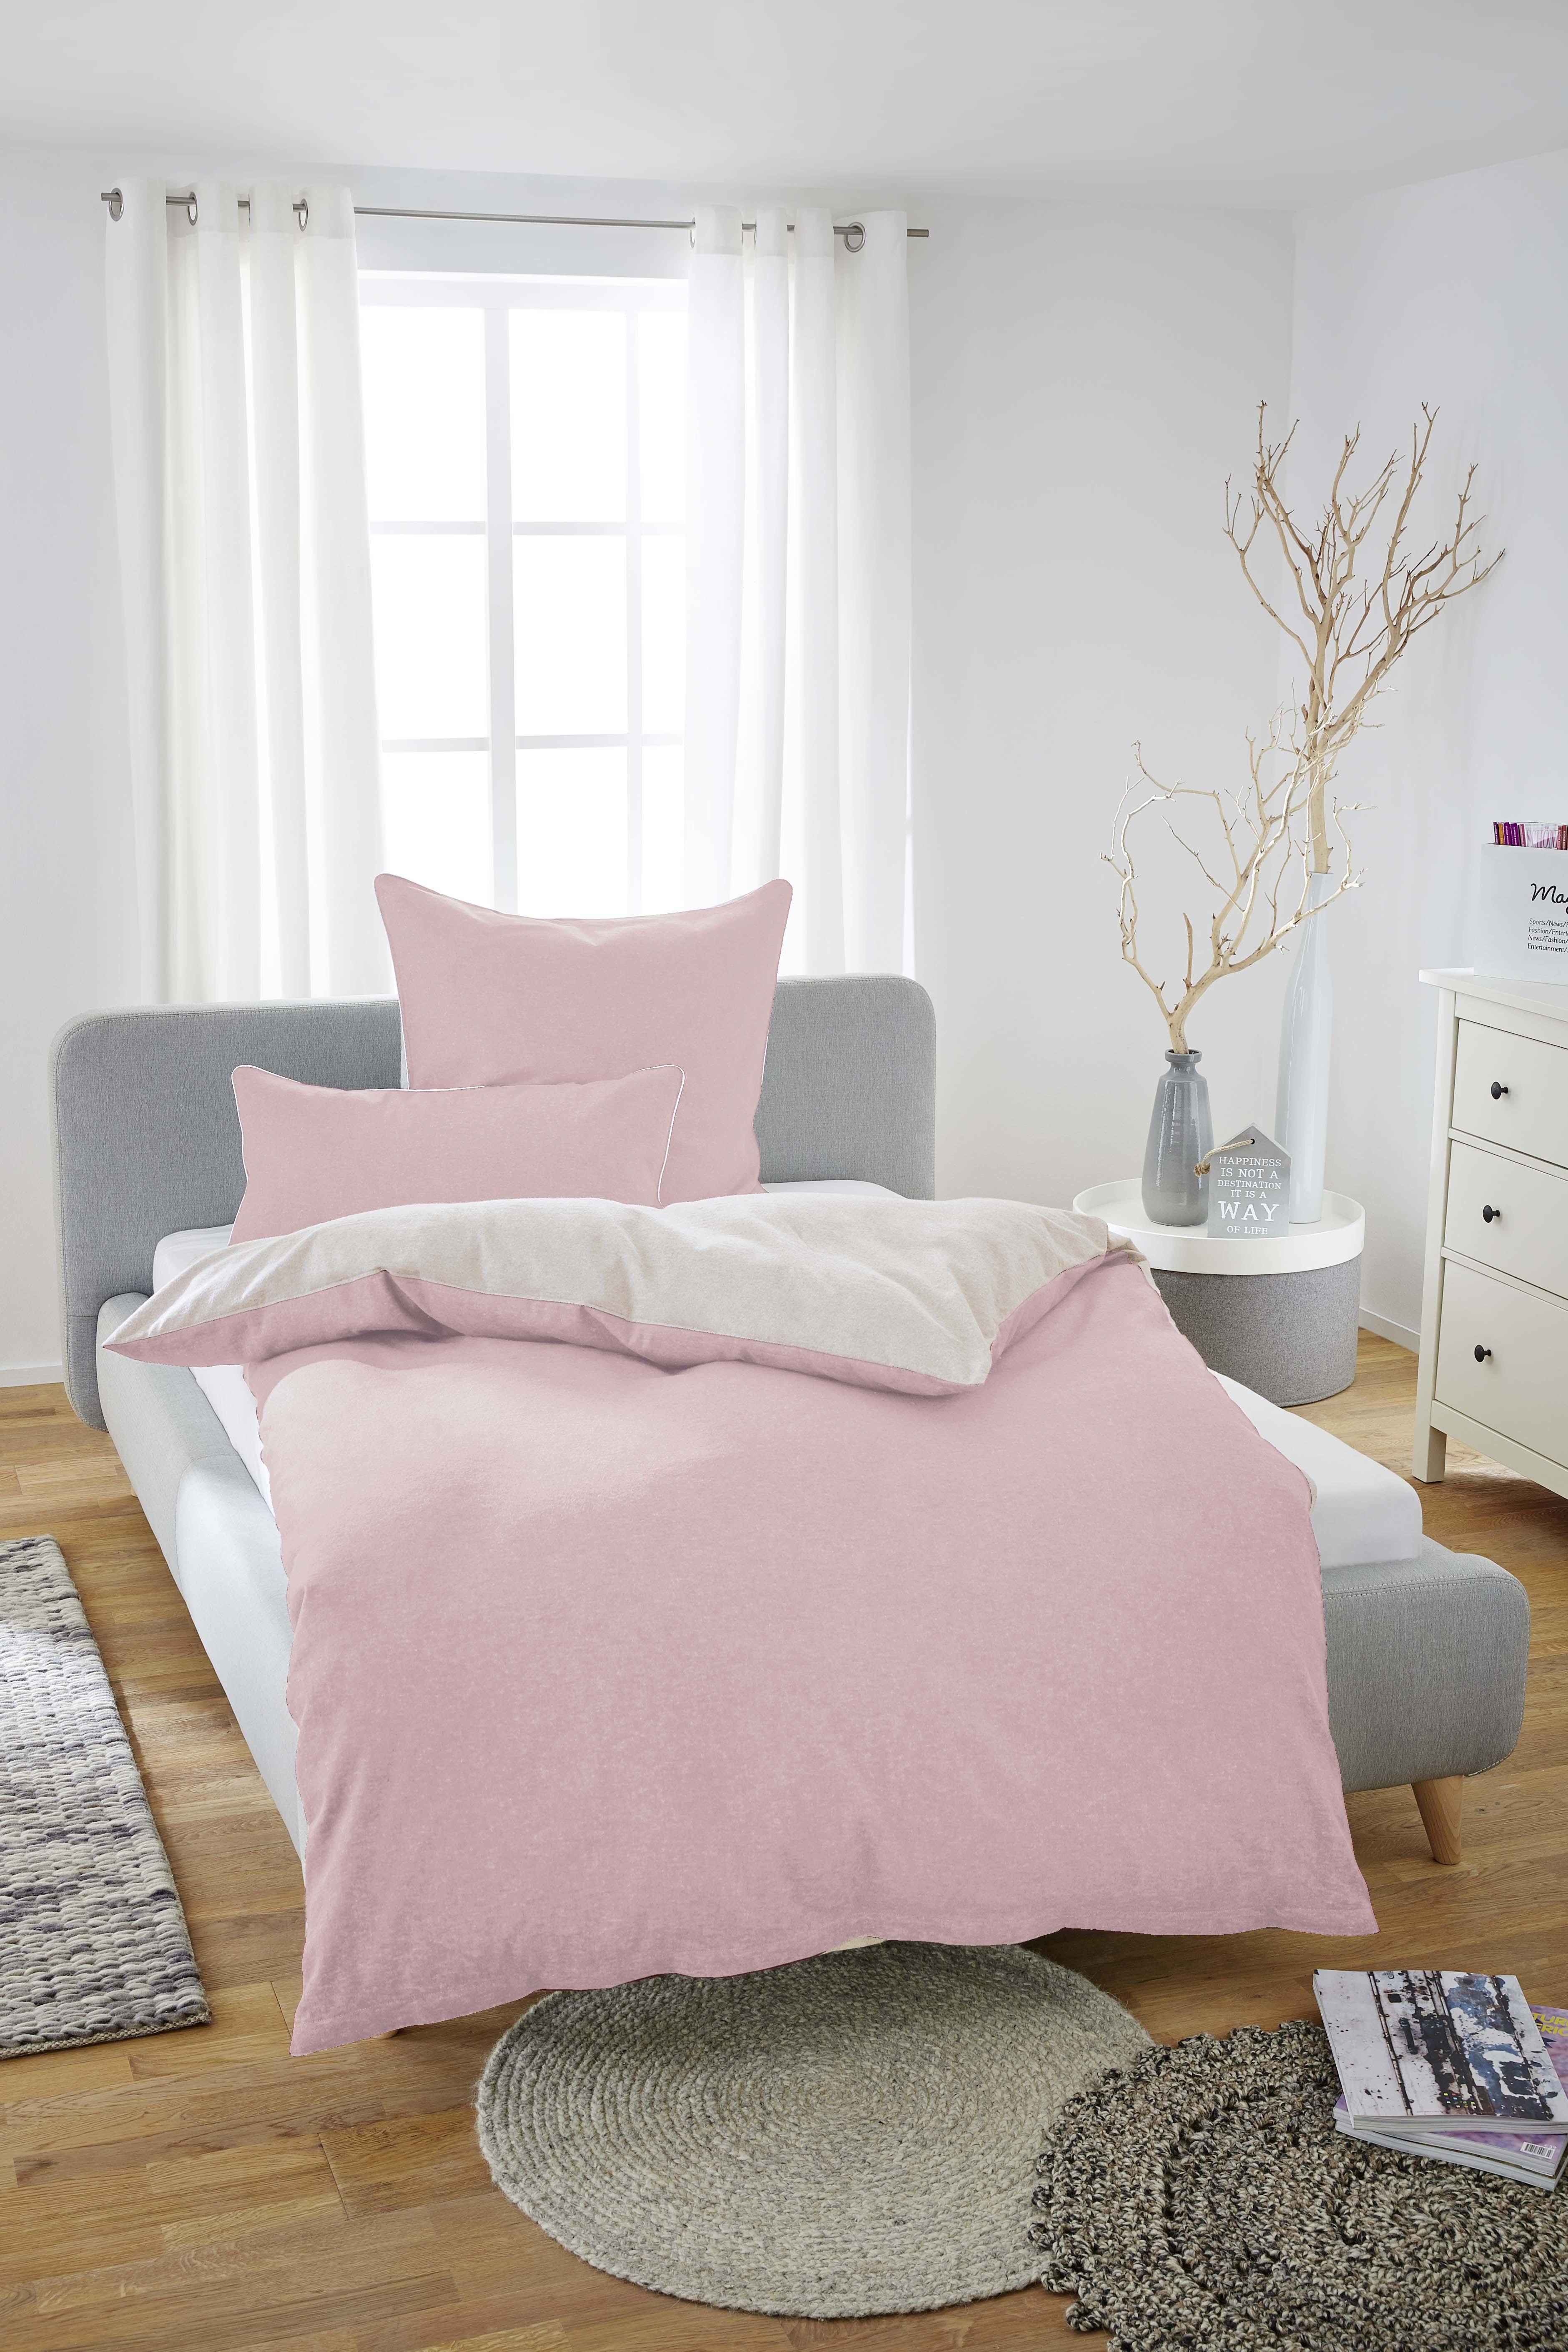 biberna melange flanell bettw sche nach ko tex standard 100 80 x 80 135 x 200 cm sturmgrau. Black Bedroom Furniture Sets. Home Design Ideas